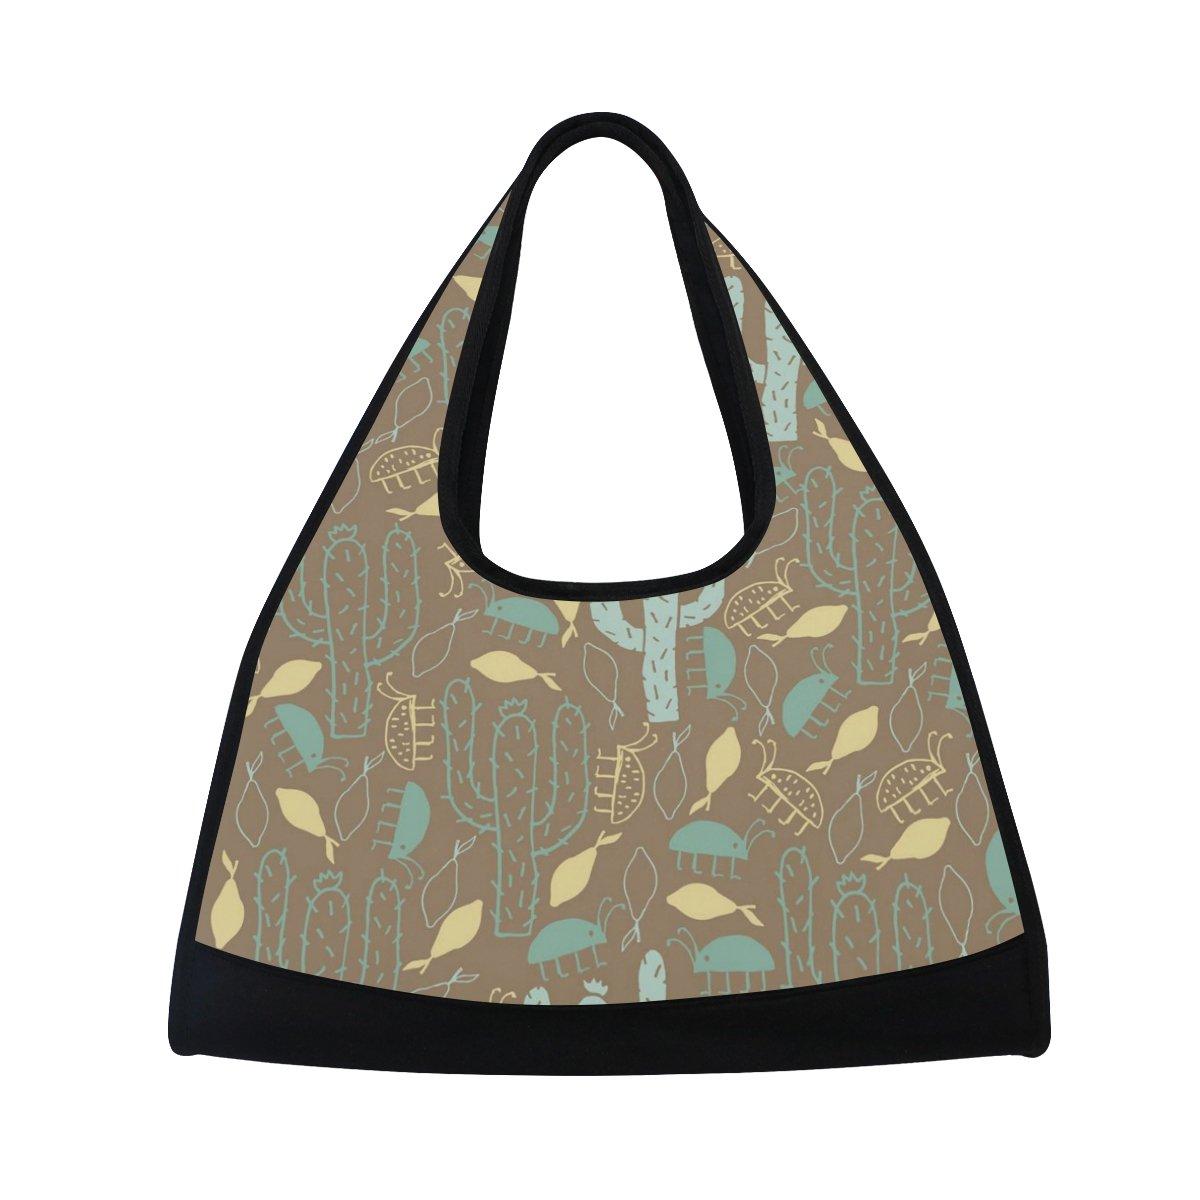 Sport Gym Bag Tropical Plants Cactus Pattern Canvas Travel Duffel Bag